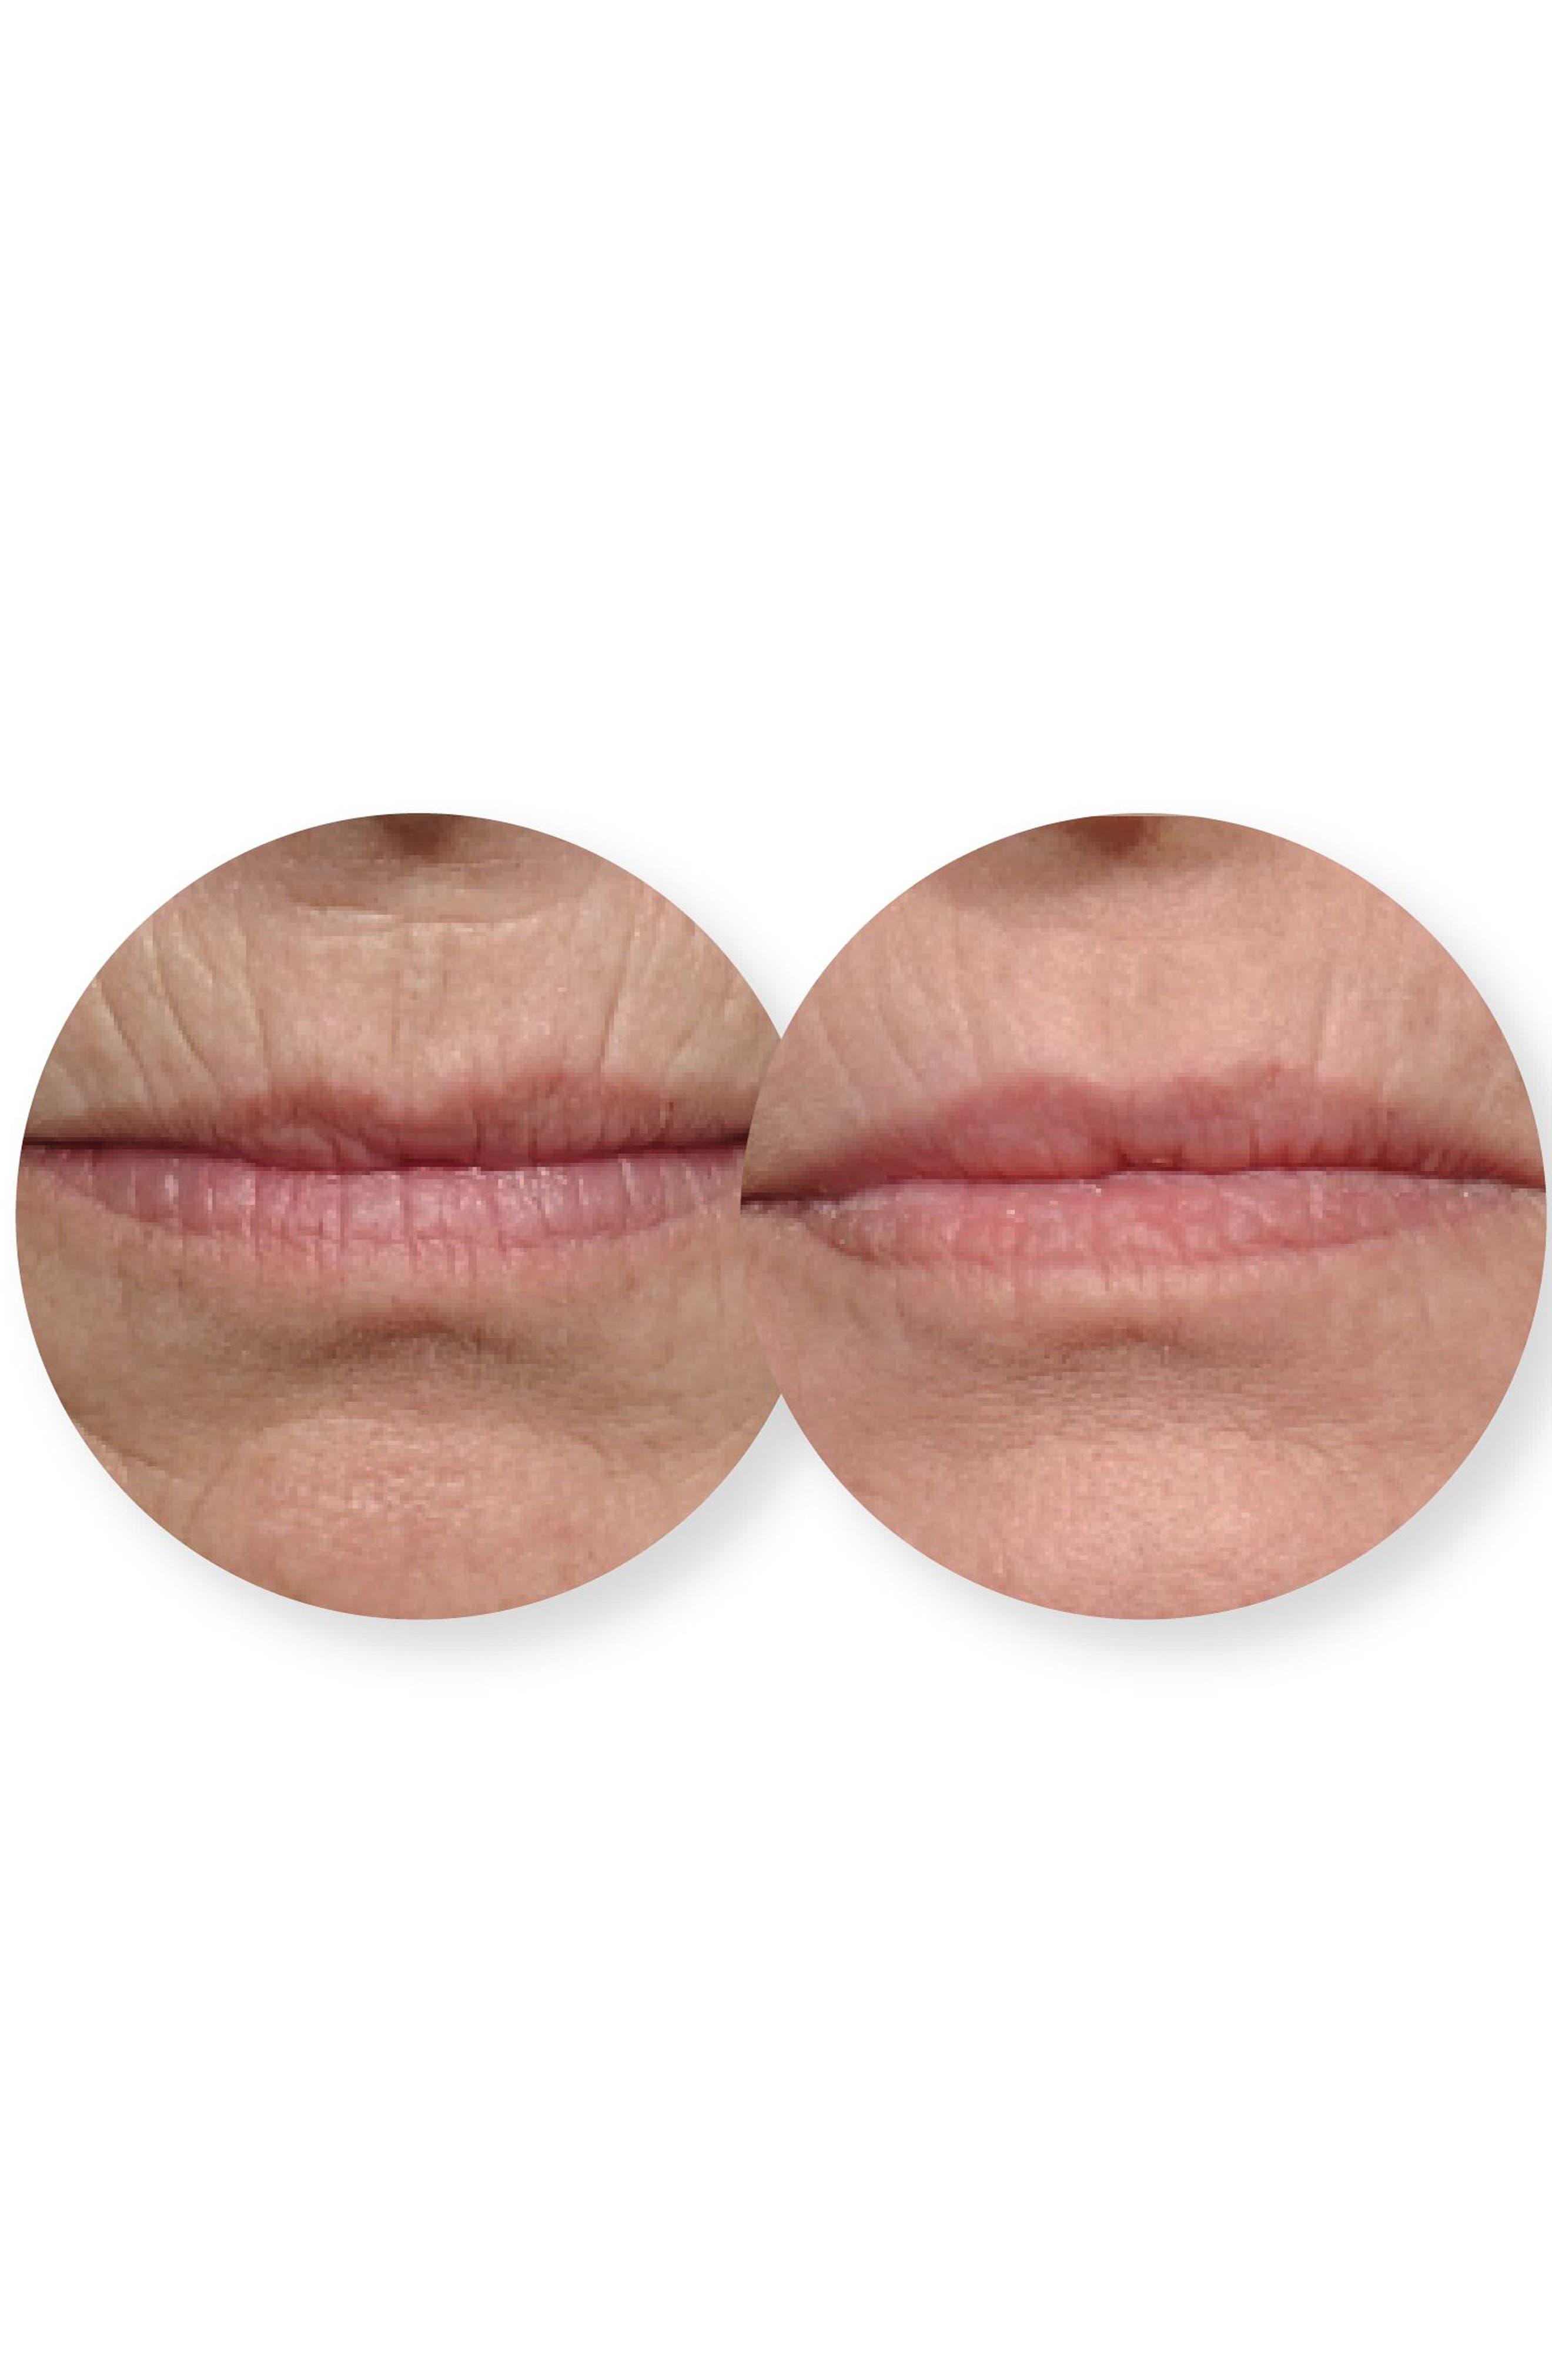 Alternate Image 4  - Dermovia Lace Your Face Rejuvenating Collagen Compression Facial Mask (Nordstrom Exclusive)